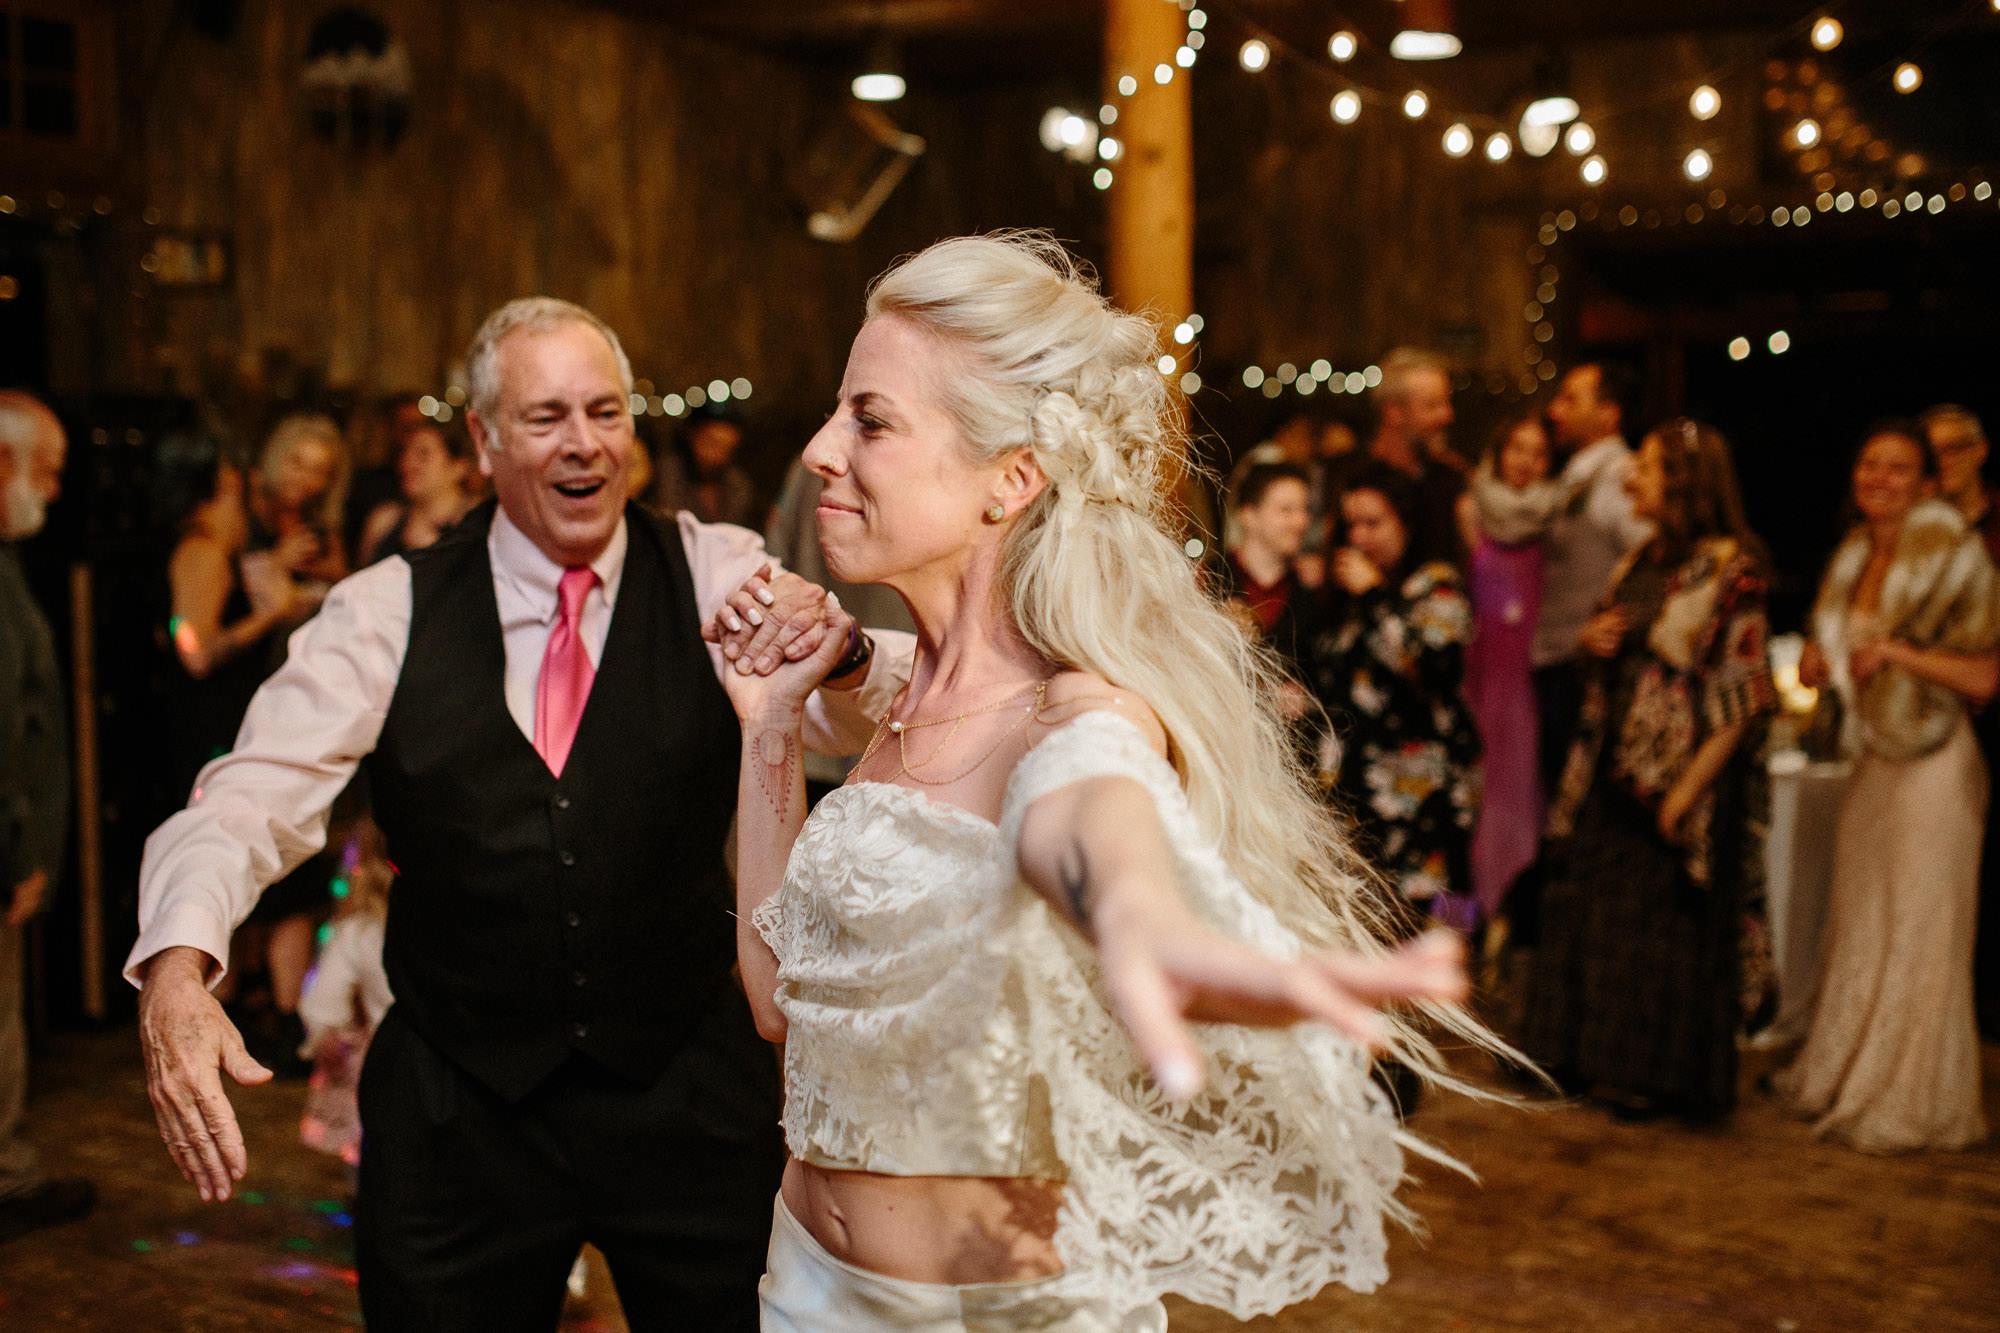 bucci-barn-wedding-elopement-evergreen-boulder-denver-colorado-adventerous-romantic-timeless-115.jpg